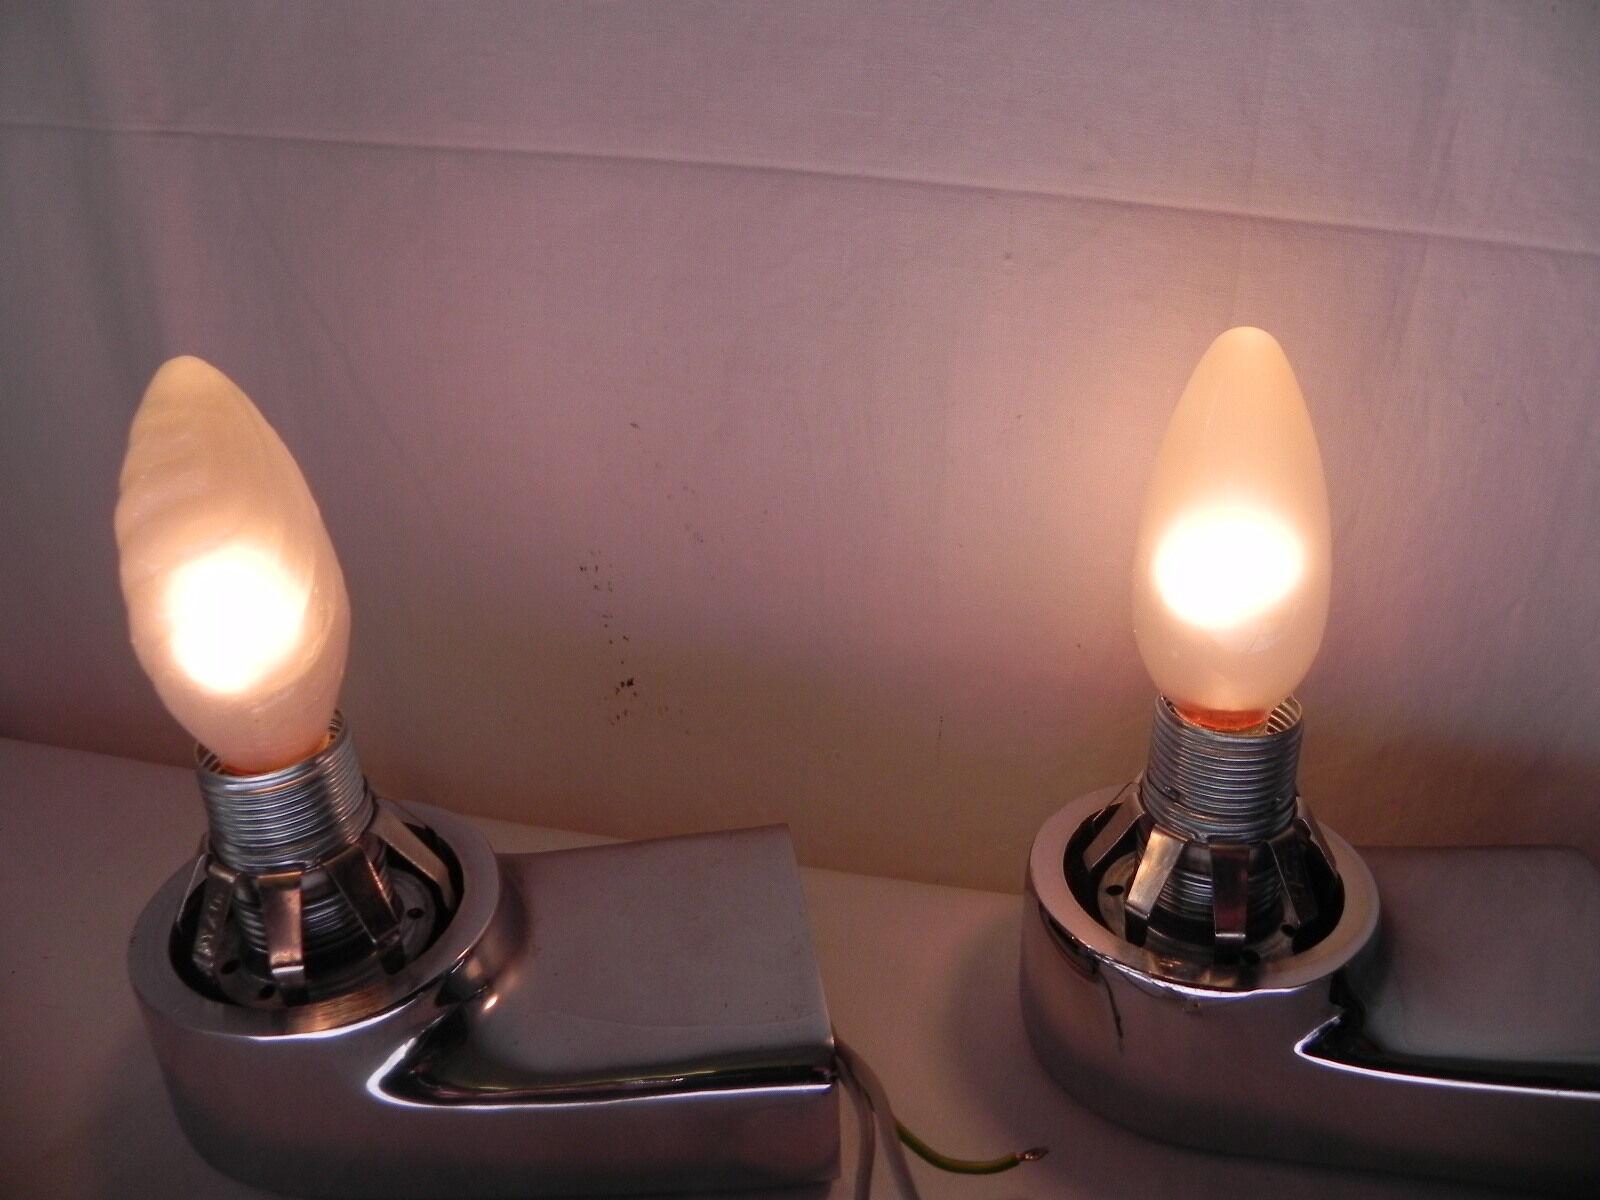 paar wandleuchte wandlampe badleuchte lampe leuchte badezimmer chrom glas a52 eur 50 00. Black Bedroom Furniture Sets. Home Design Ideas